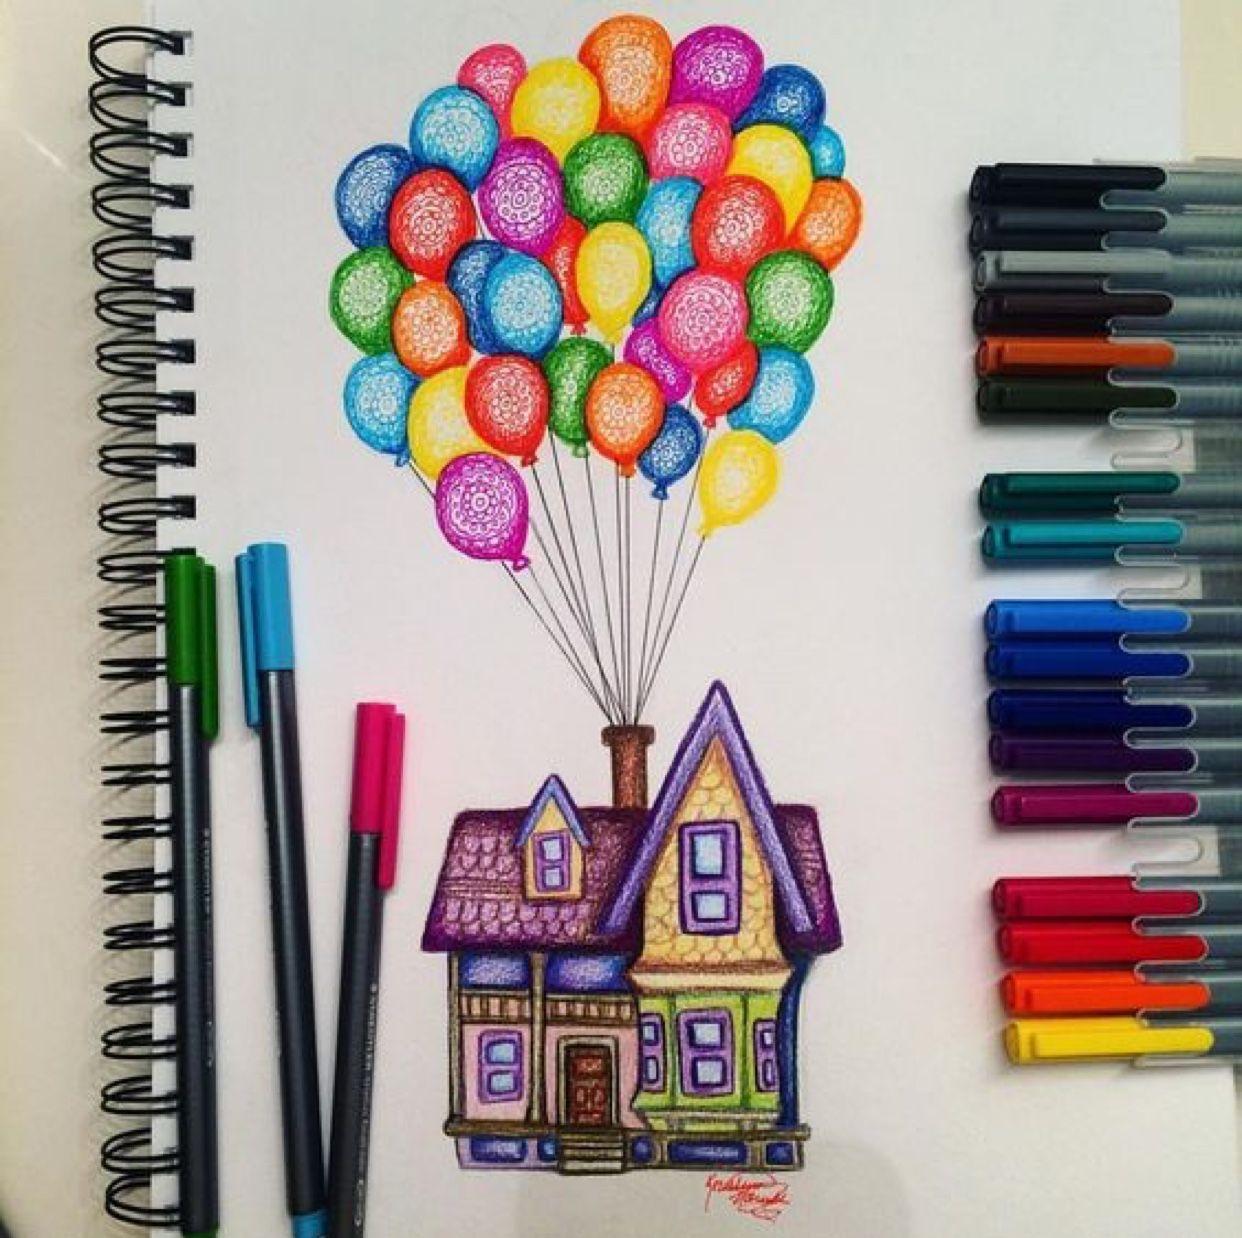 Is this look hard ??? FOLLOW ME!! | Drawings, Cool drawings